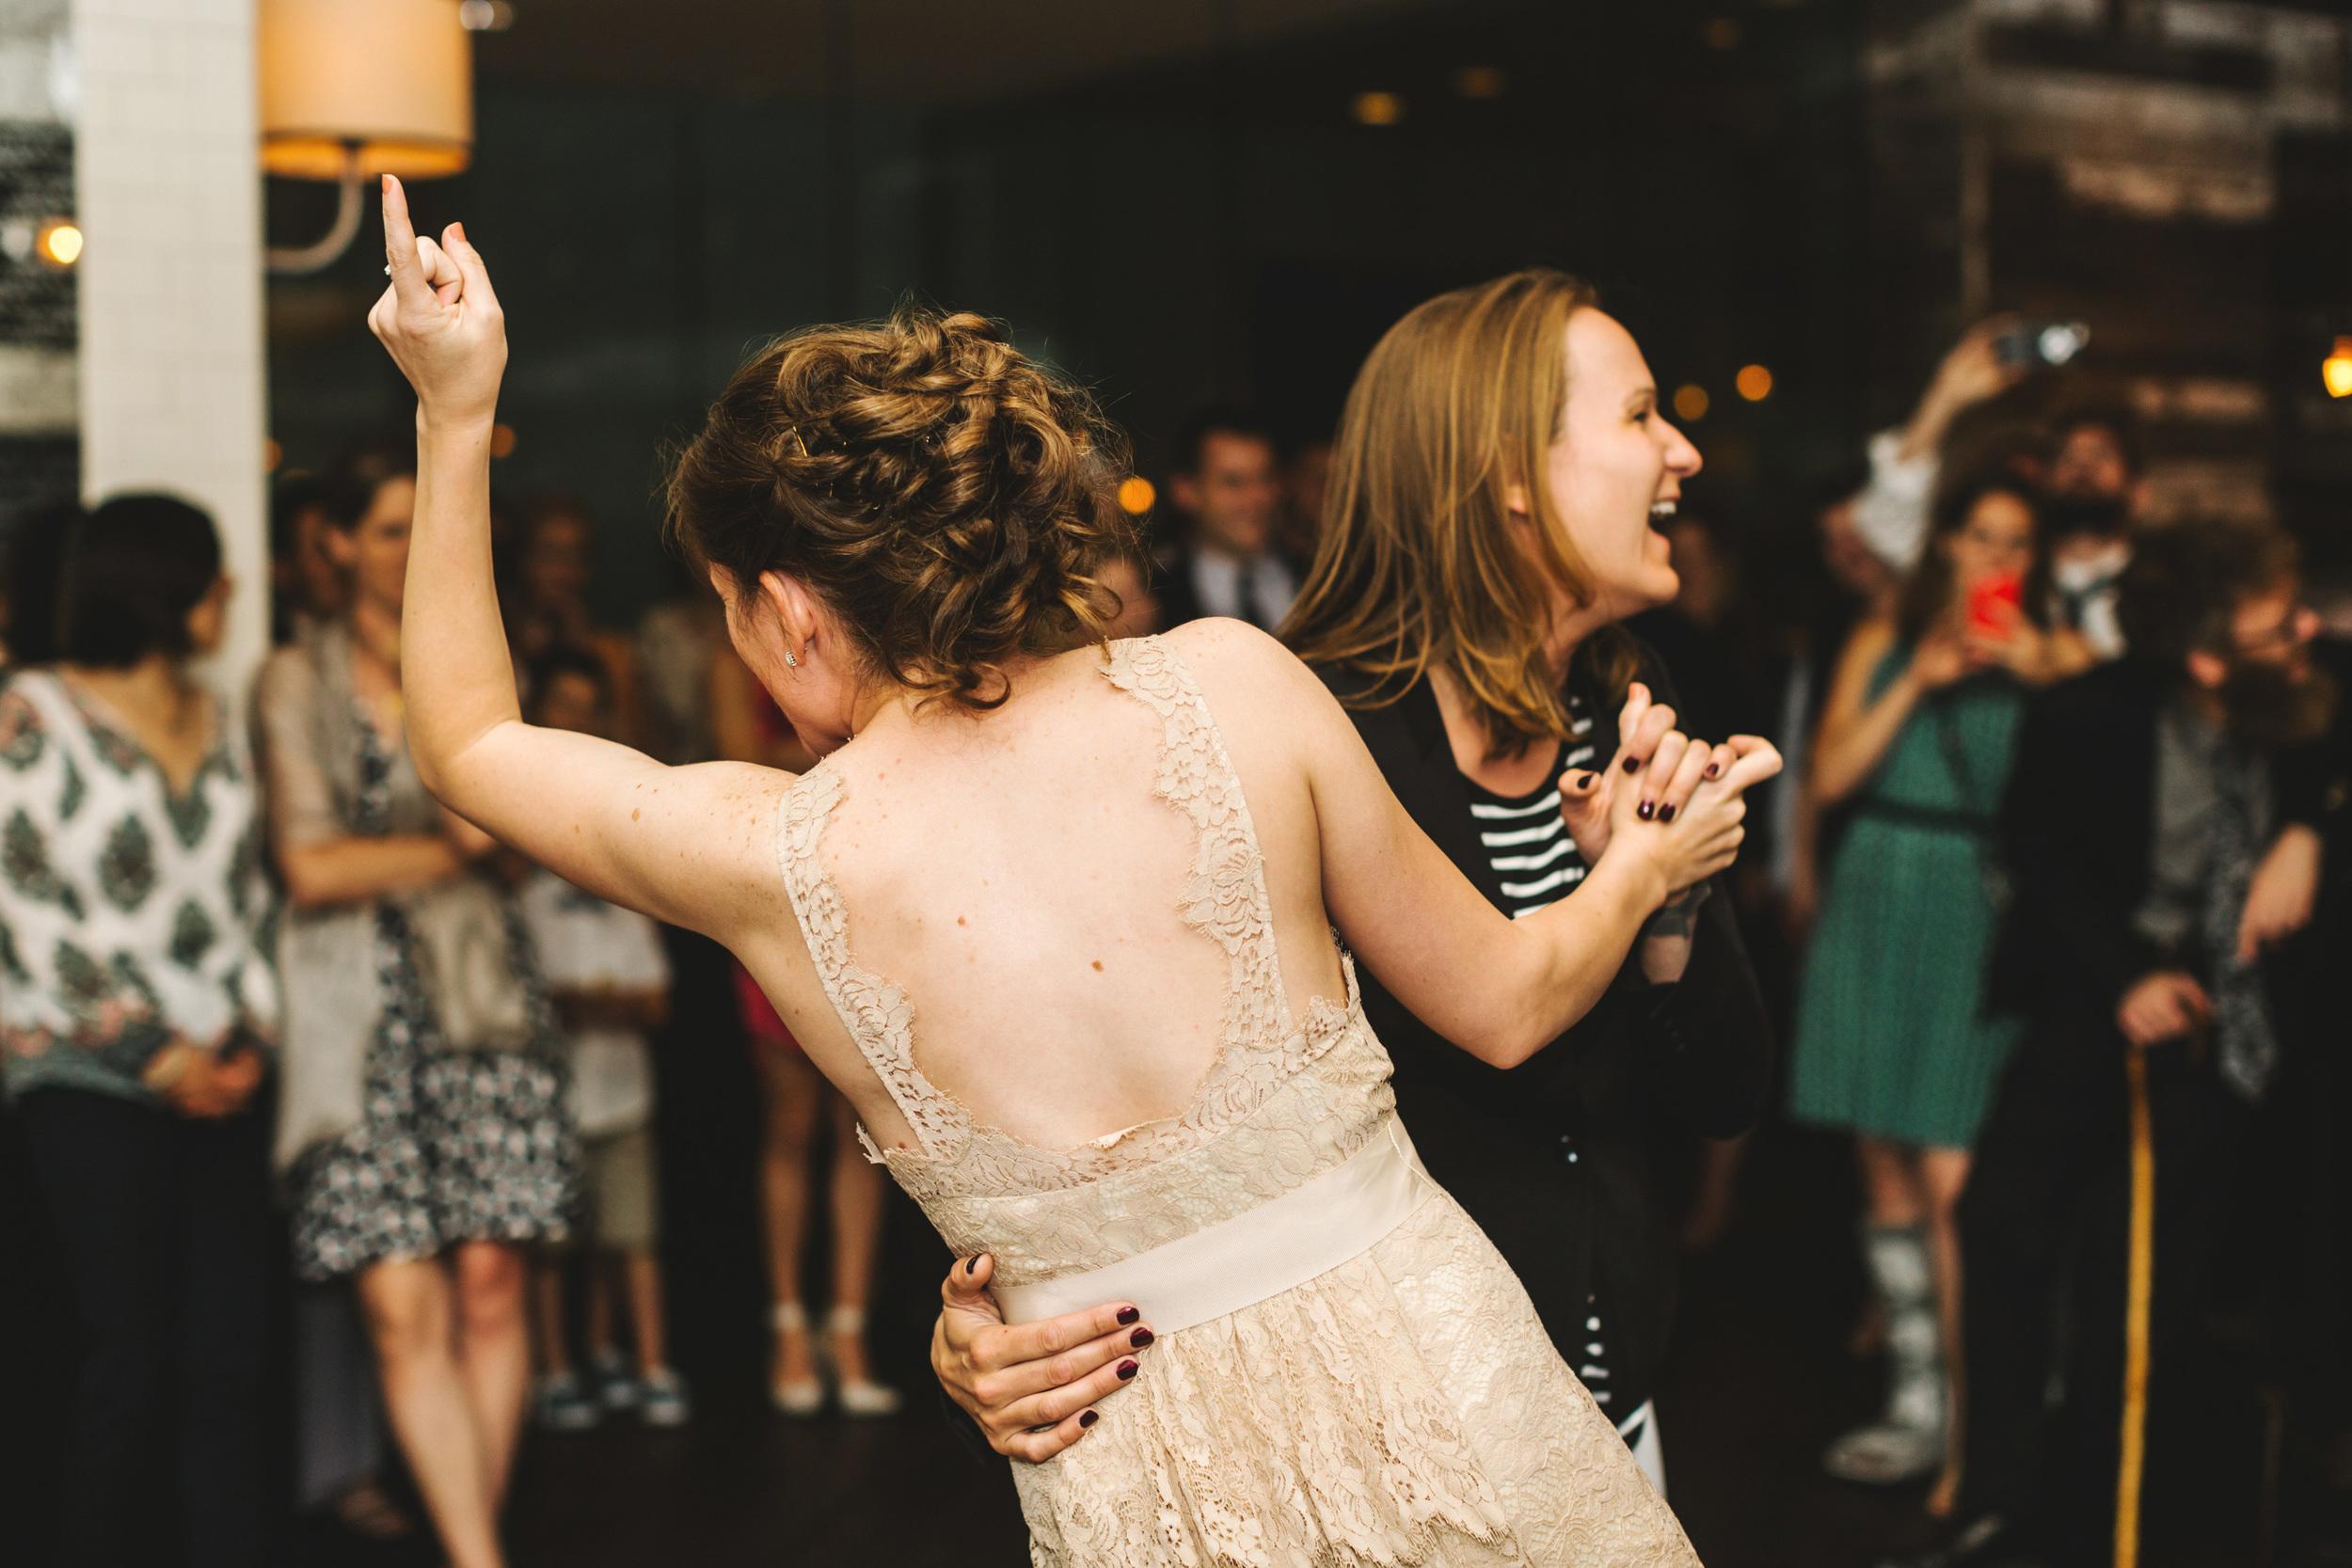 Boston_Wedding_Photographer_Lena_Mirisola-65.jpg